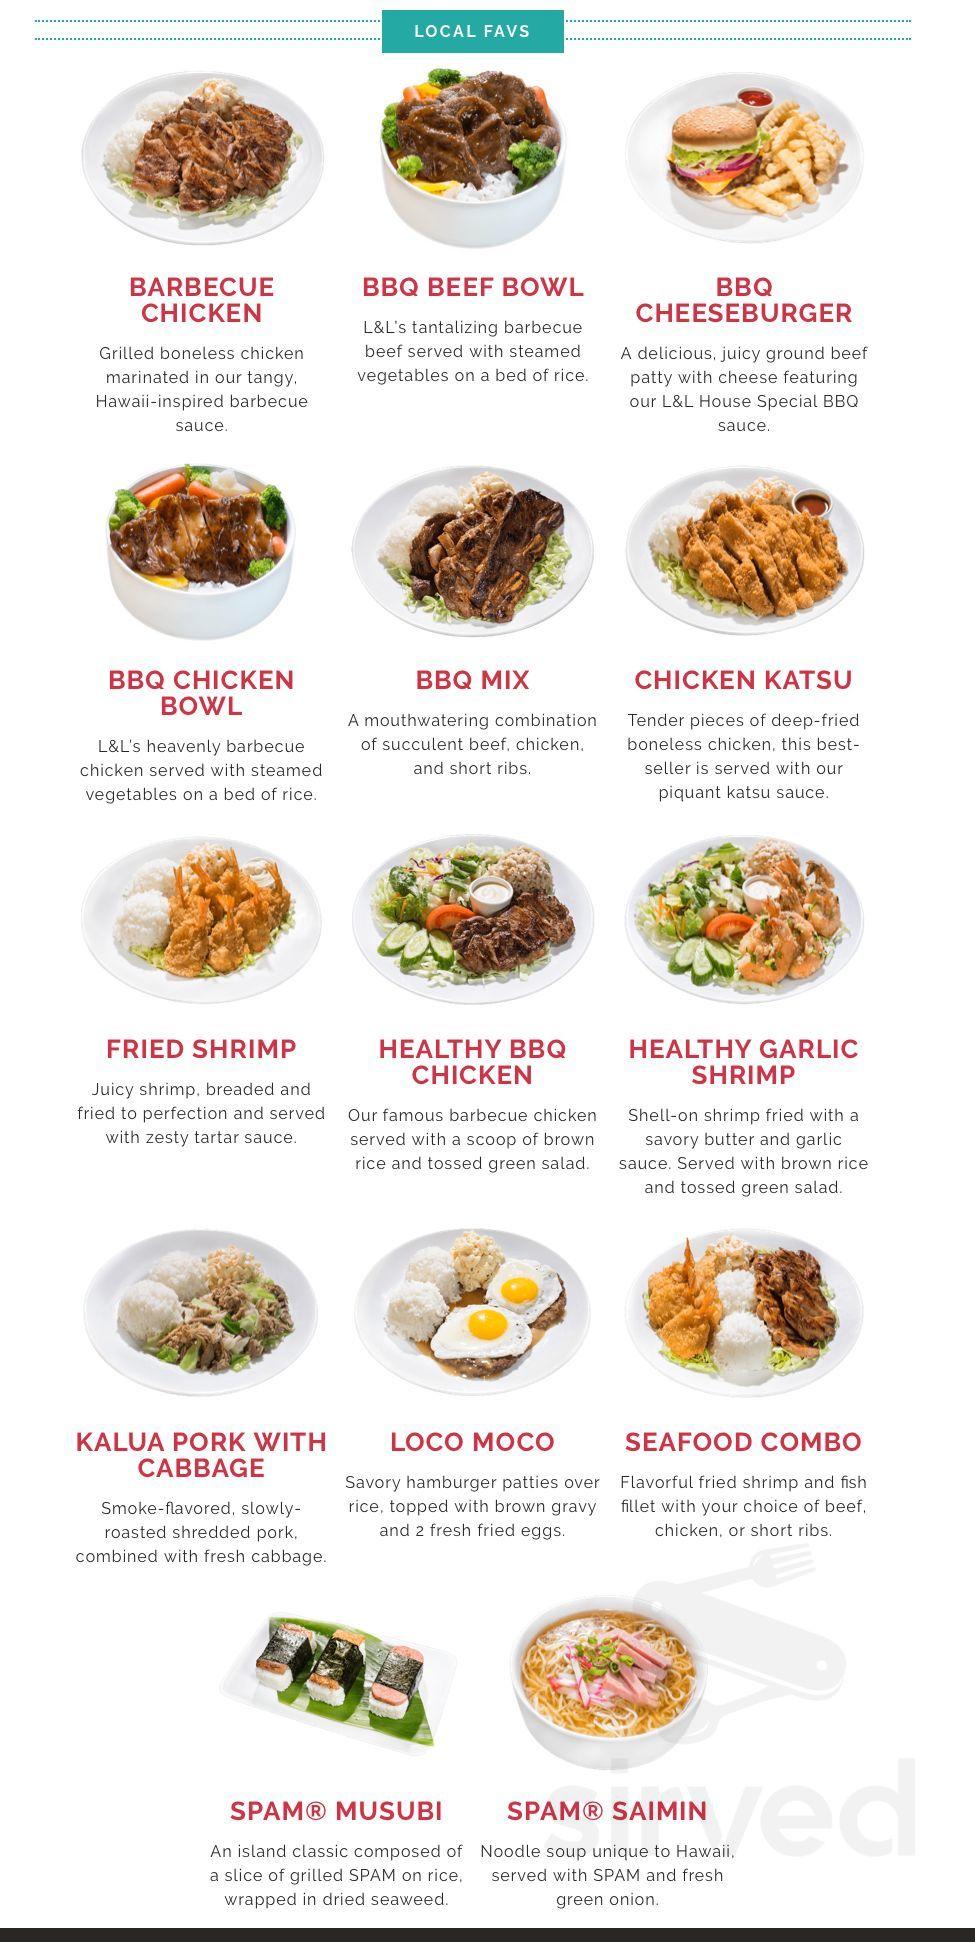 L&L Hawaiian Barbecue menu in Antioch, California, USA